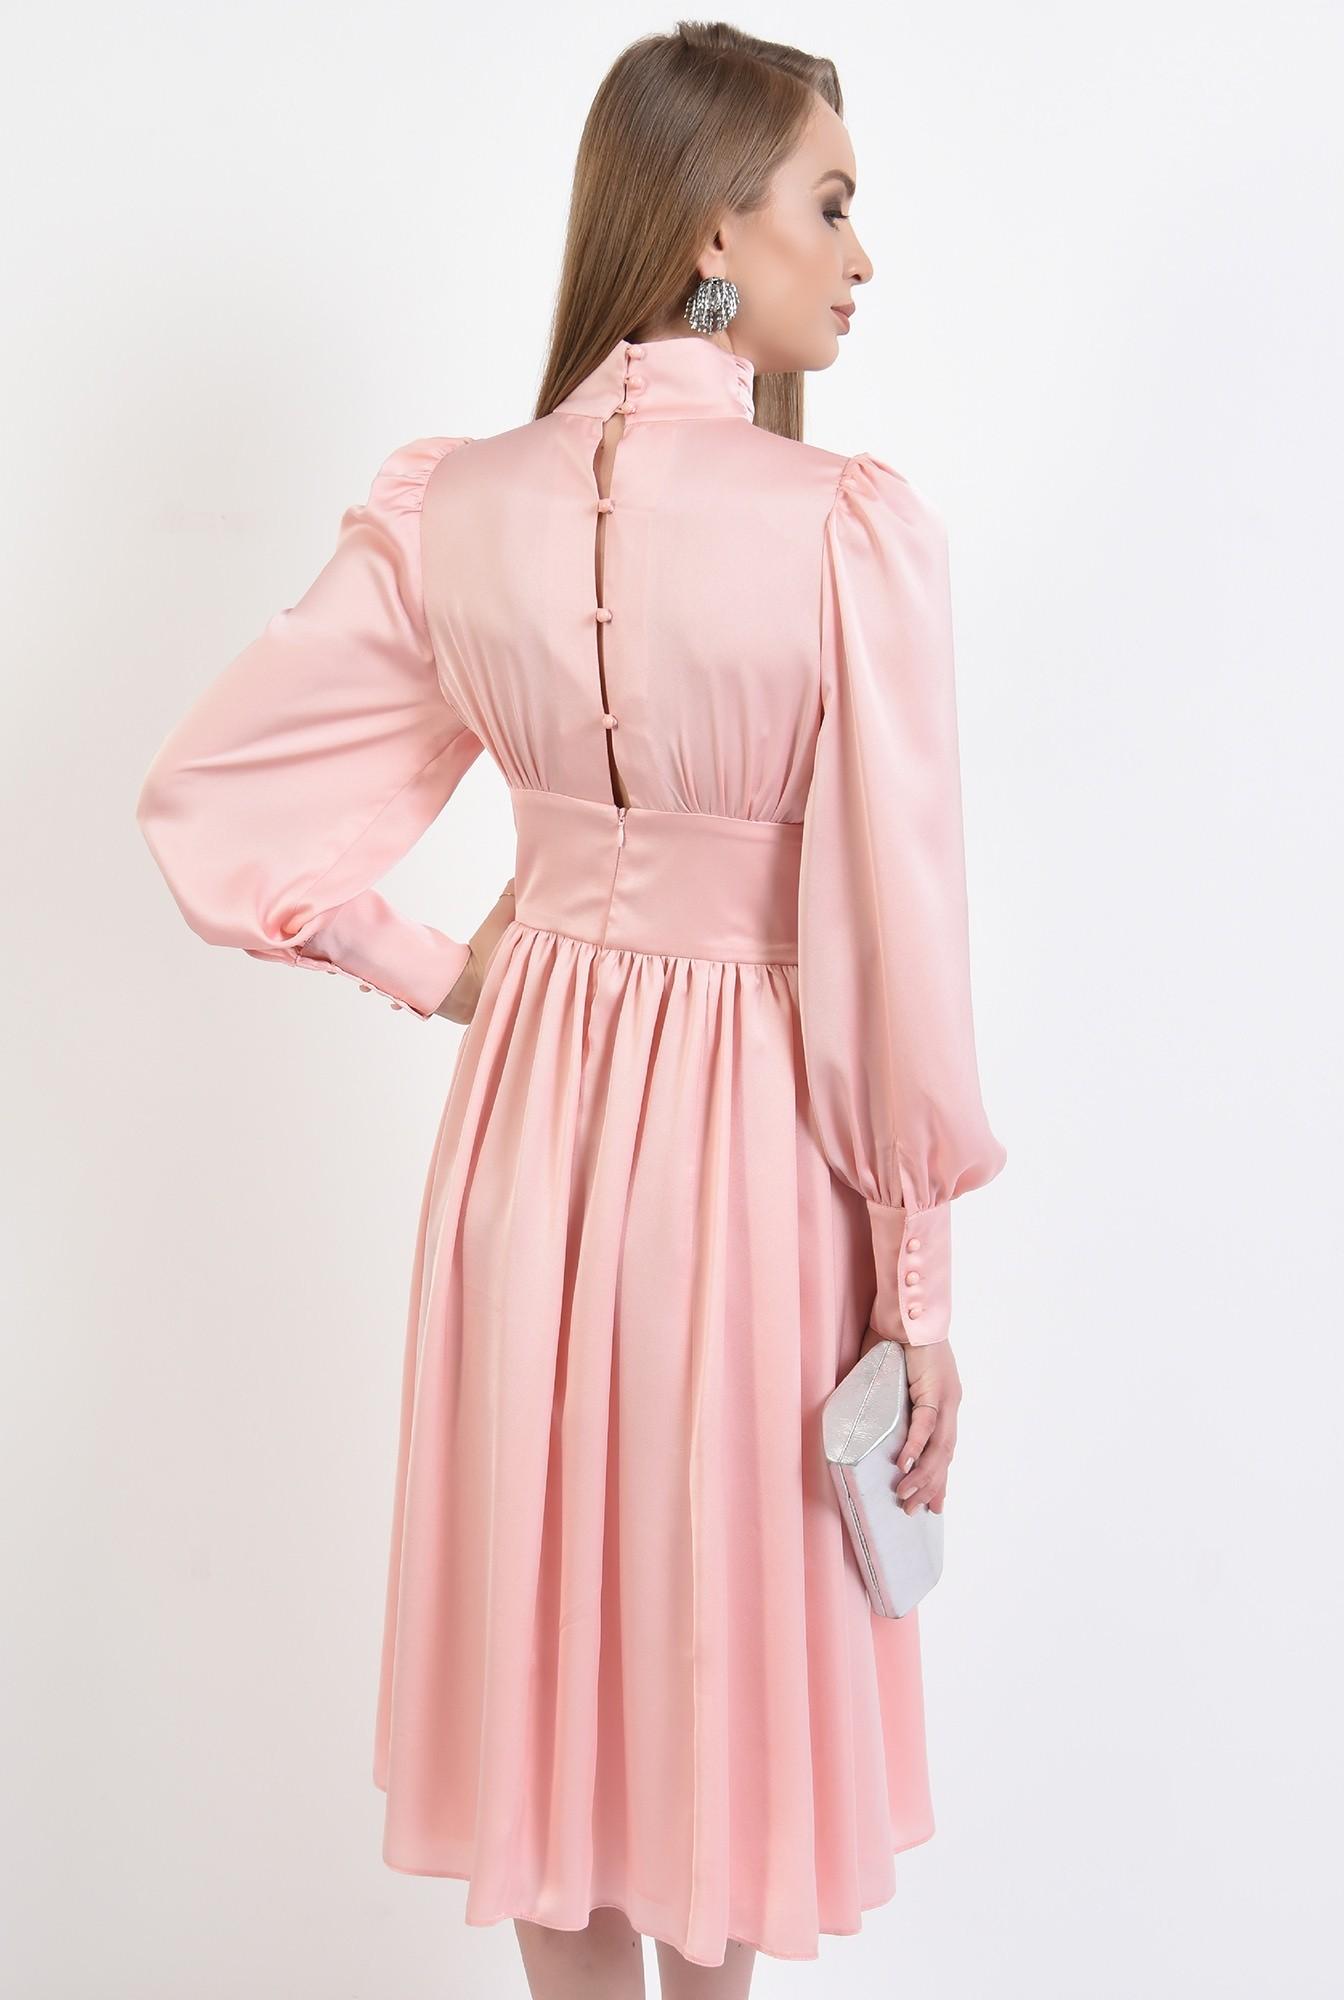 1 - 360 - rochie eleganta, din satin, evazata, midi, brau fronsat, roz